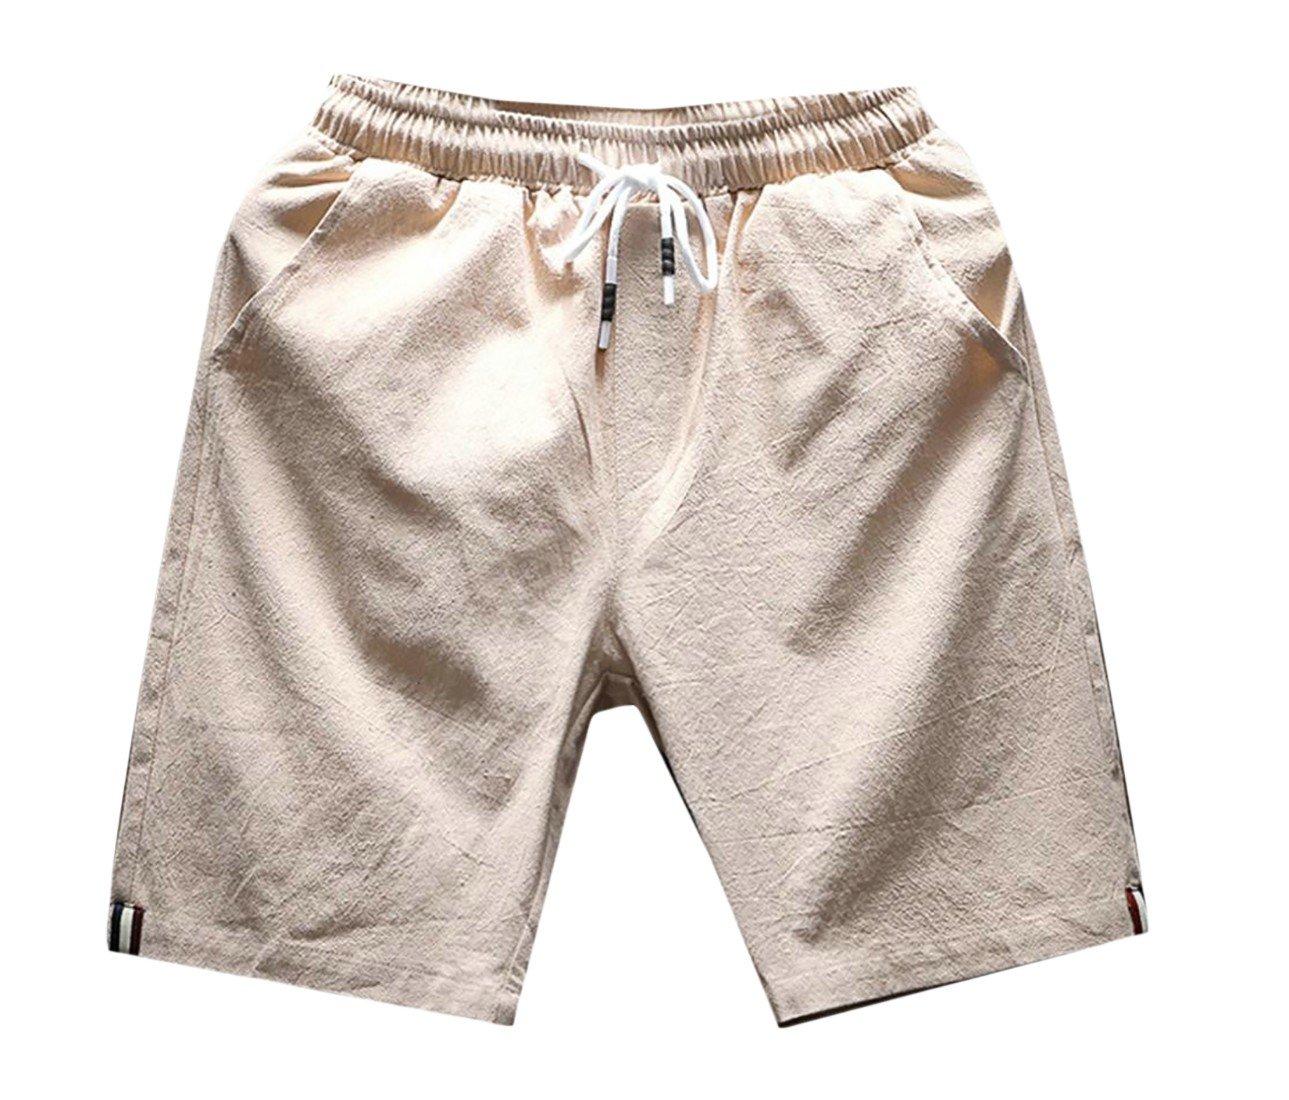 Vska Men's Linen Solid Color Smocked Waist Beach Wear Pleat-Front Short Khaki L